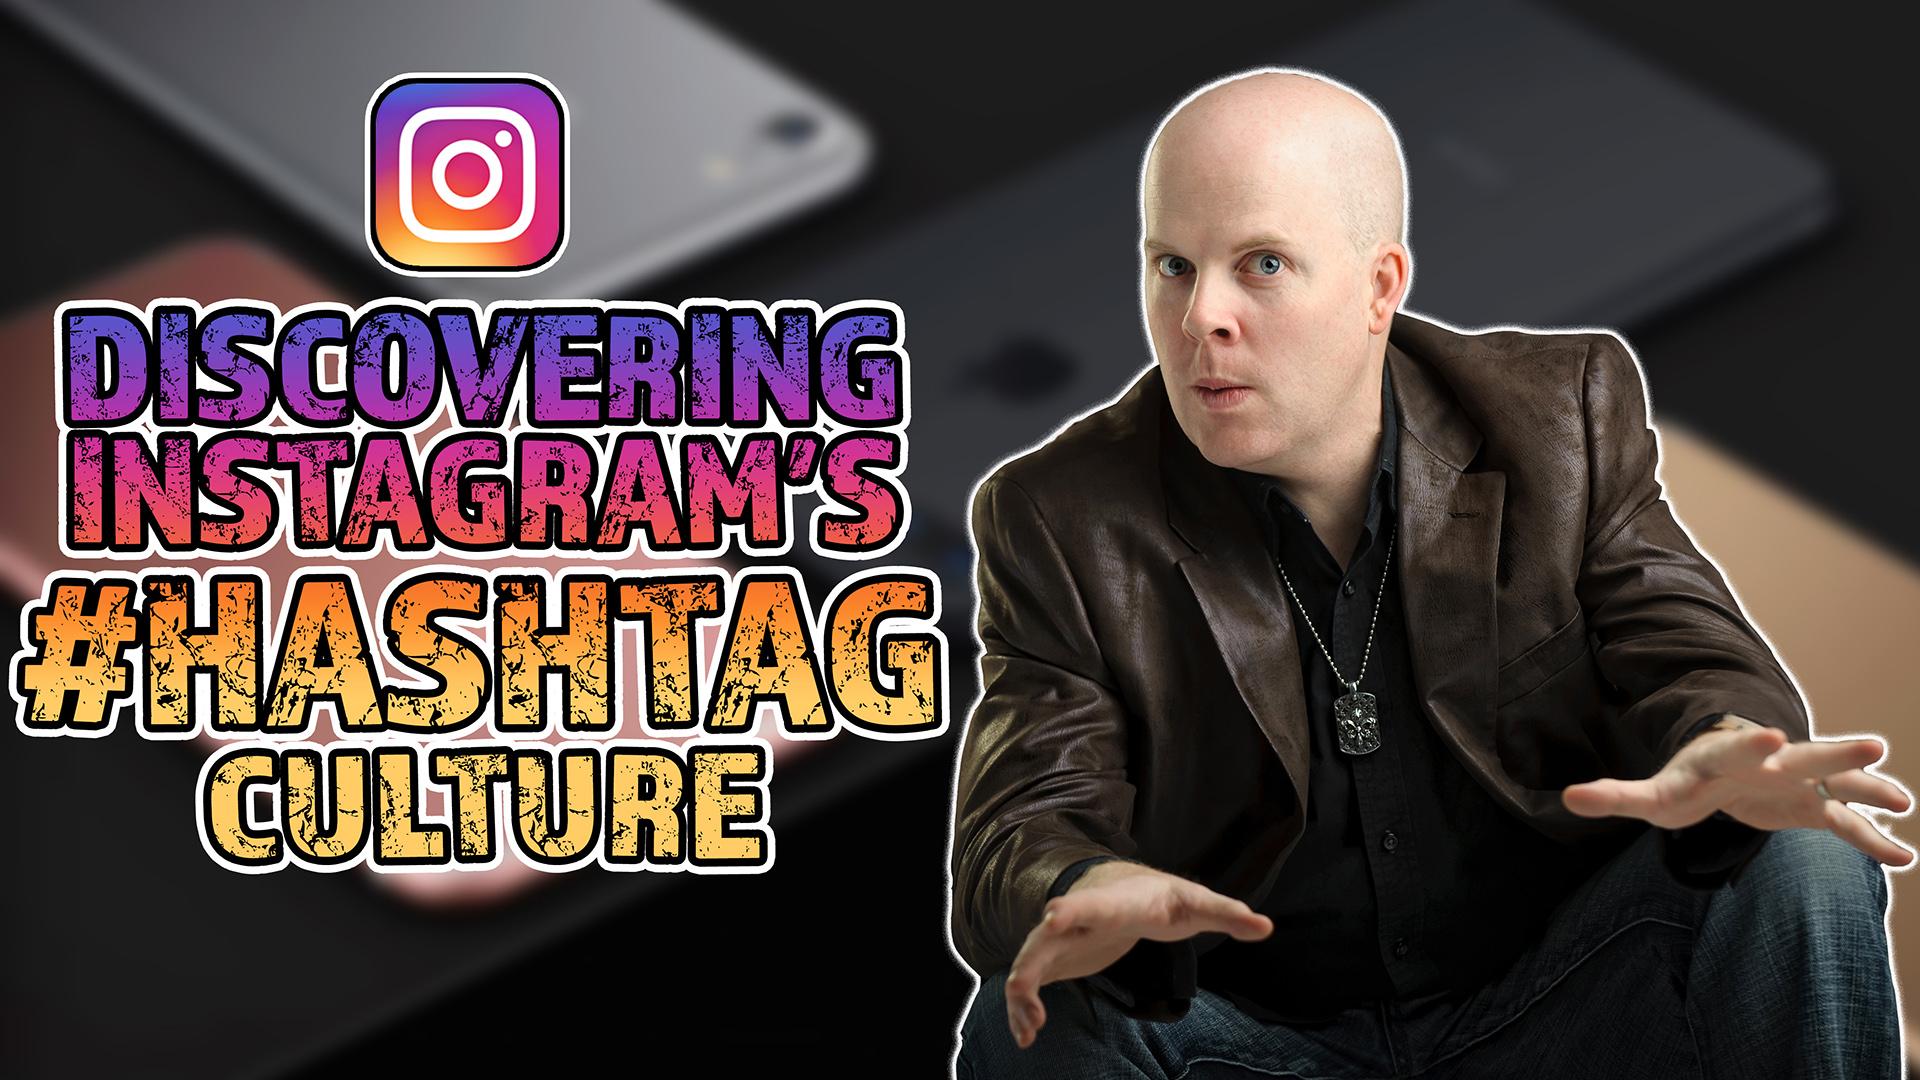 Thumb_InstagramHashtagCulture.jpg